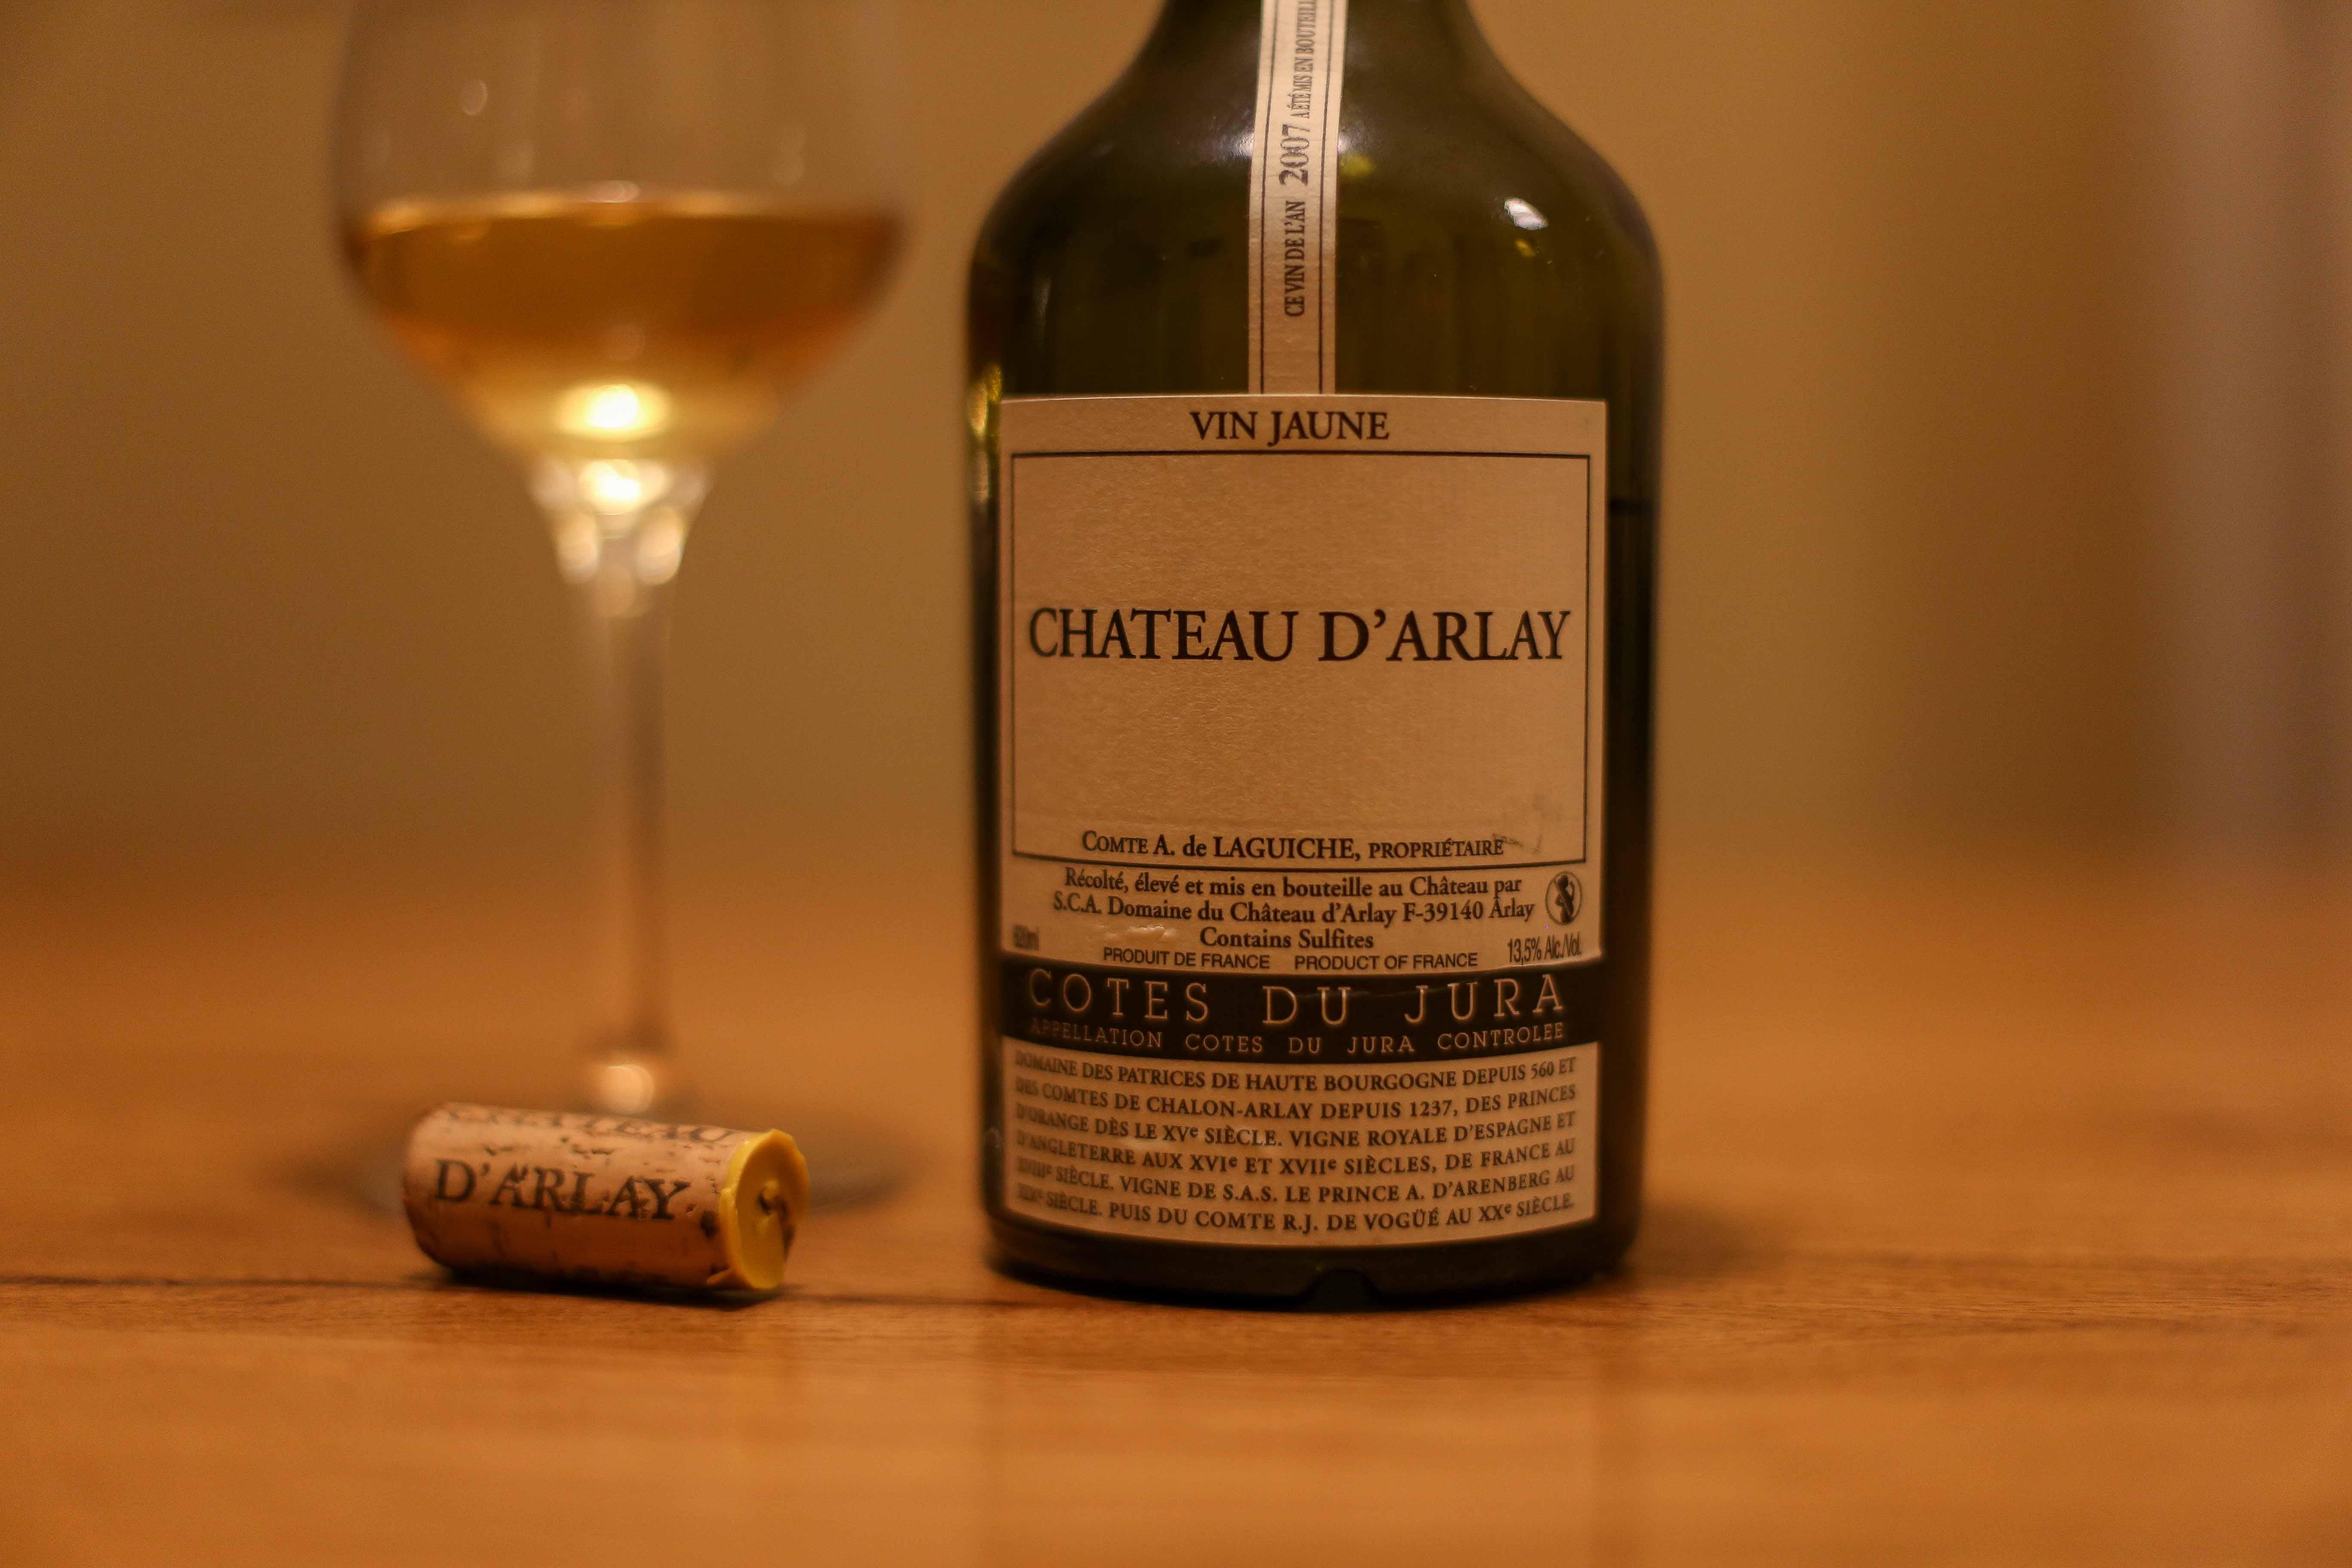 chateau_d_arlay_vin_jaune_2007_web